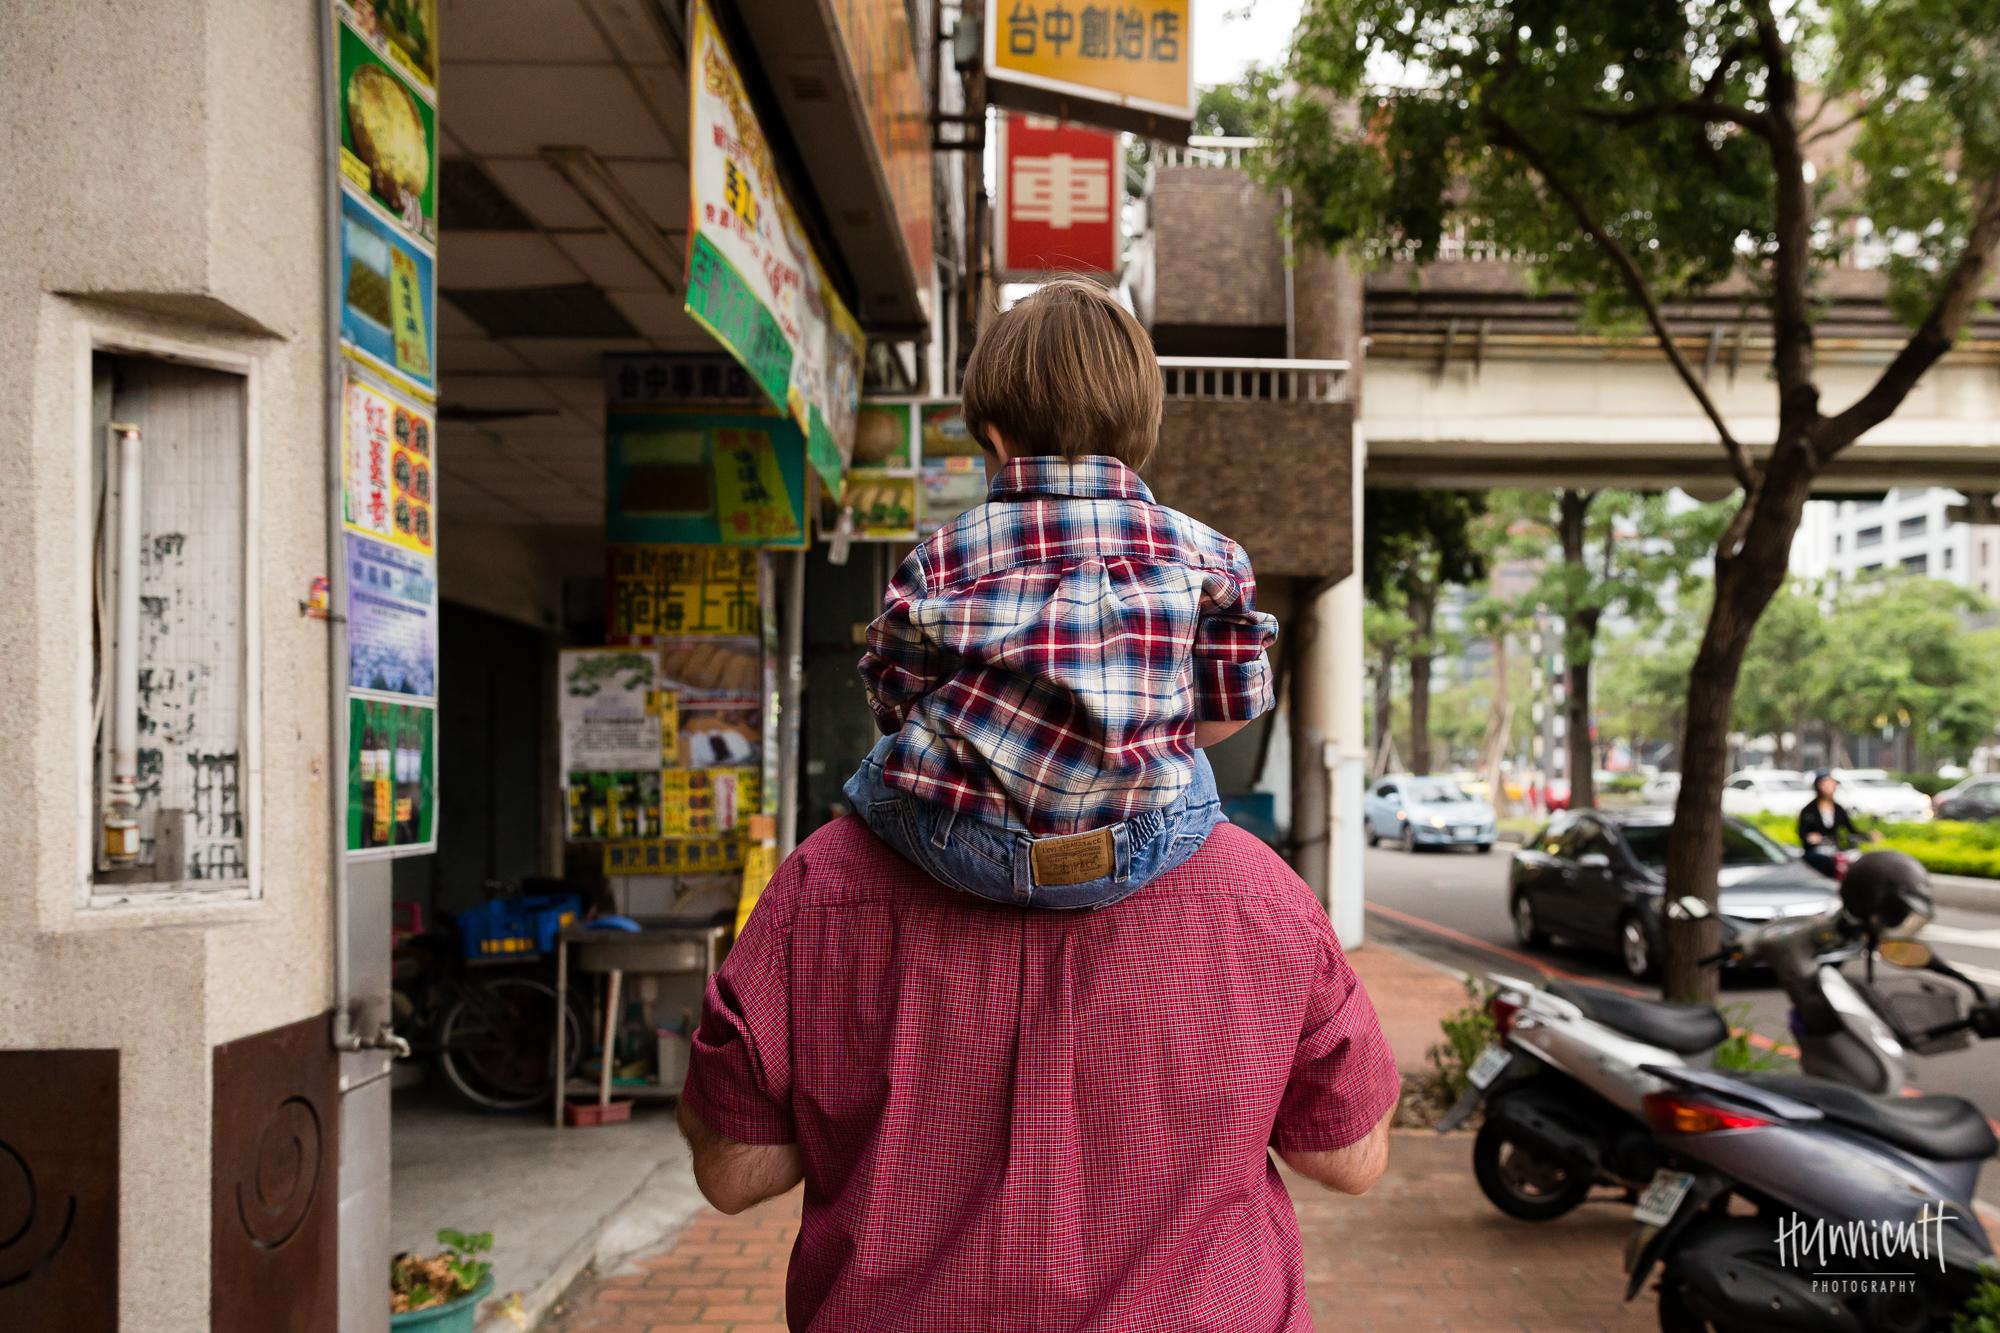 Outdoor-Modern-Urban-Family-Hunnicutt-Photography-Rebecca-Hunnicutt-Farren-Taichung-Taiwan-Exploring-Neighborhood-4